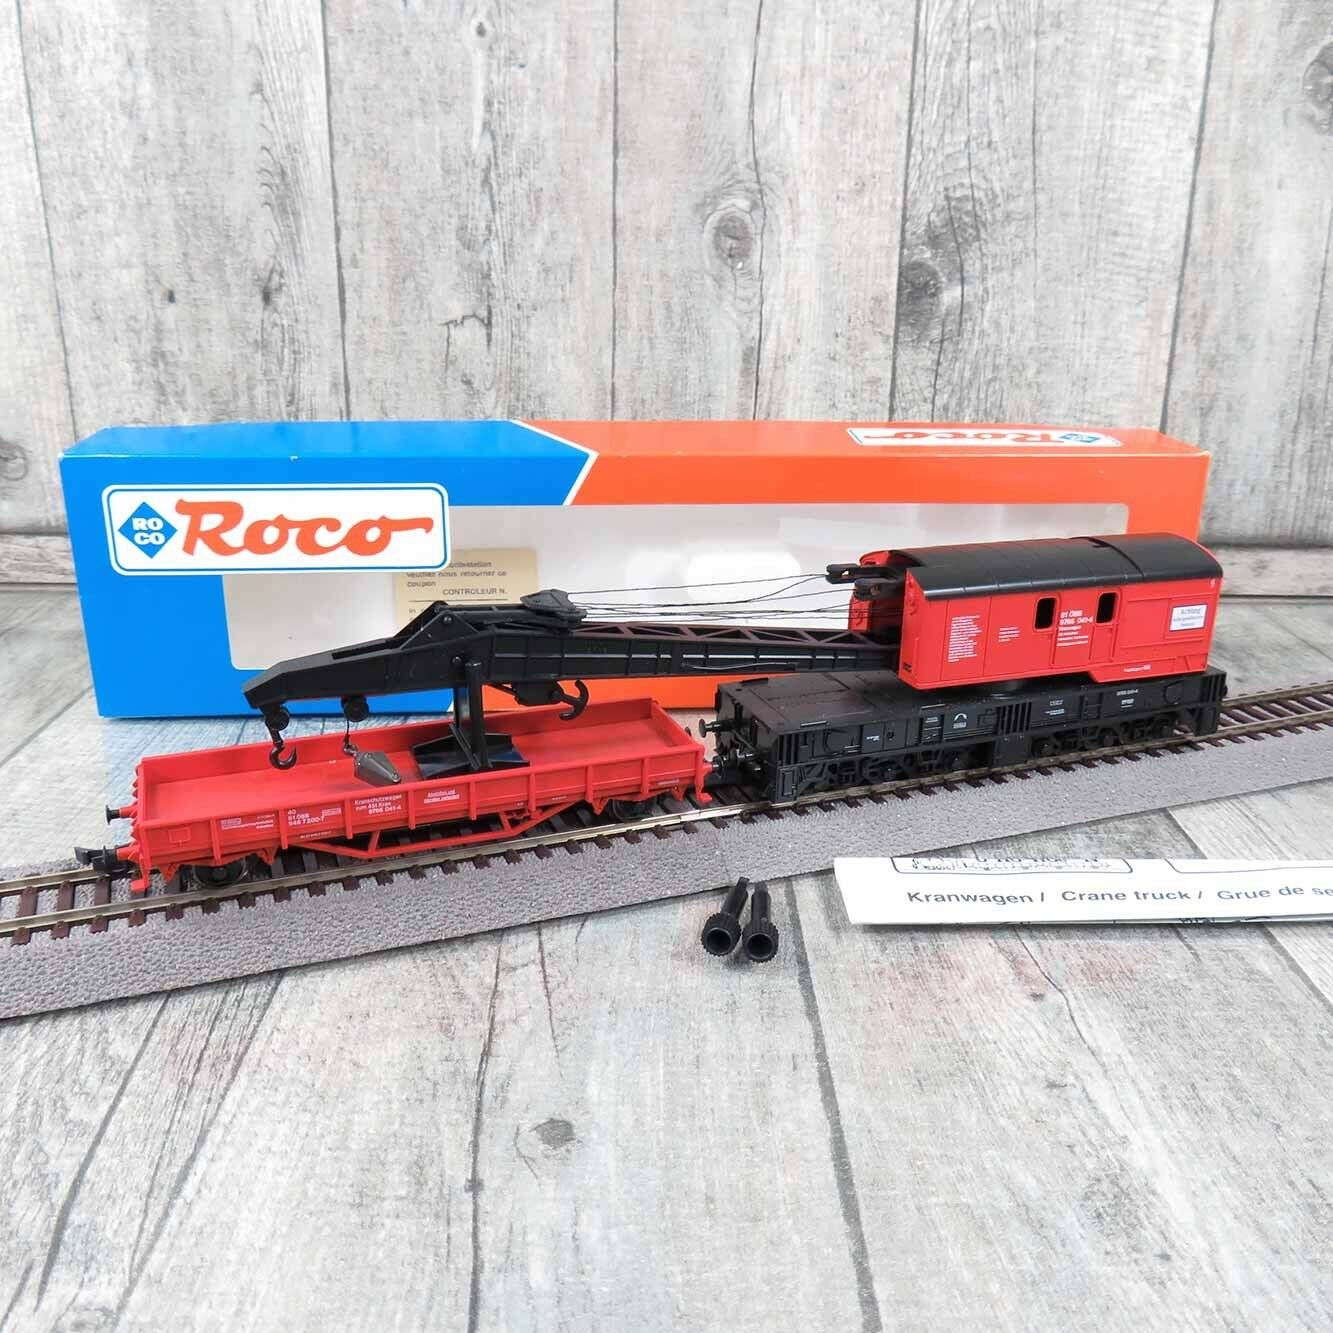 acquistare ora ROCO 47331 - H0 - ÖBB - - - Kranwagen 9766 041-4- OVP -  U18927  ordina ora i prezzi più bassi